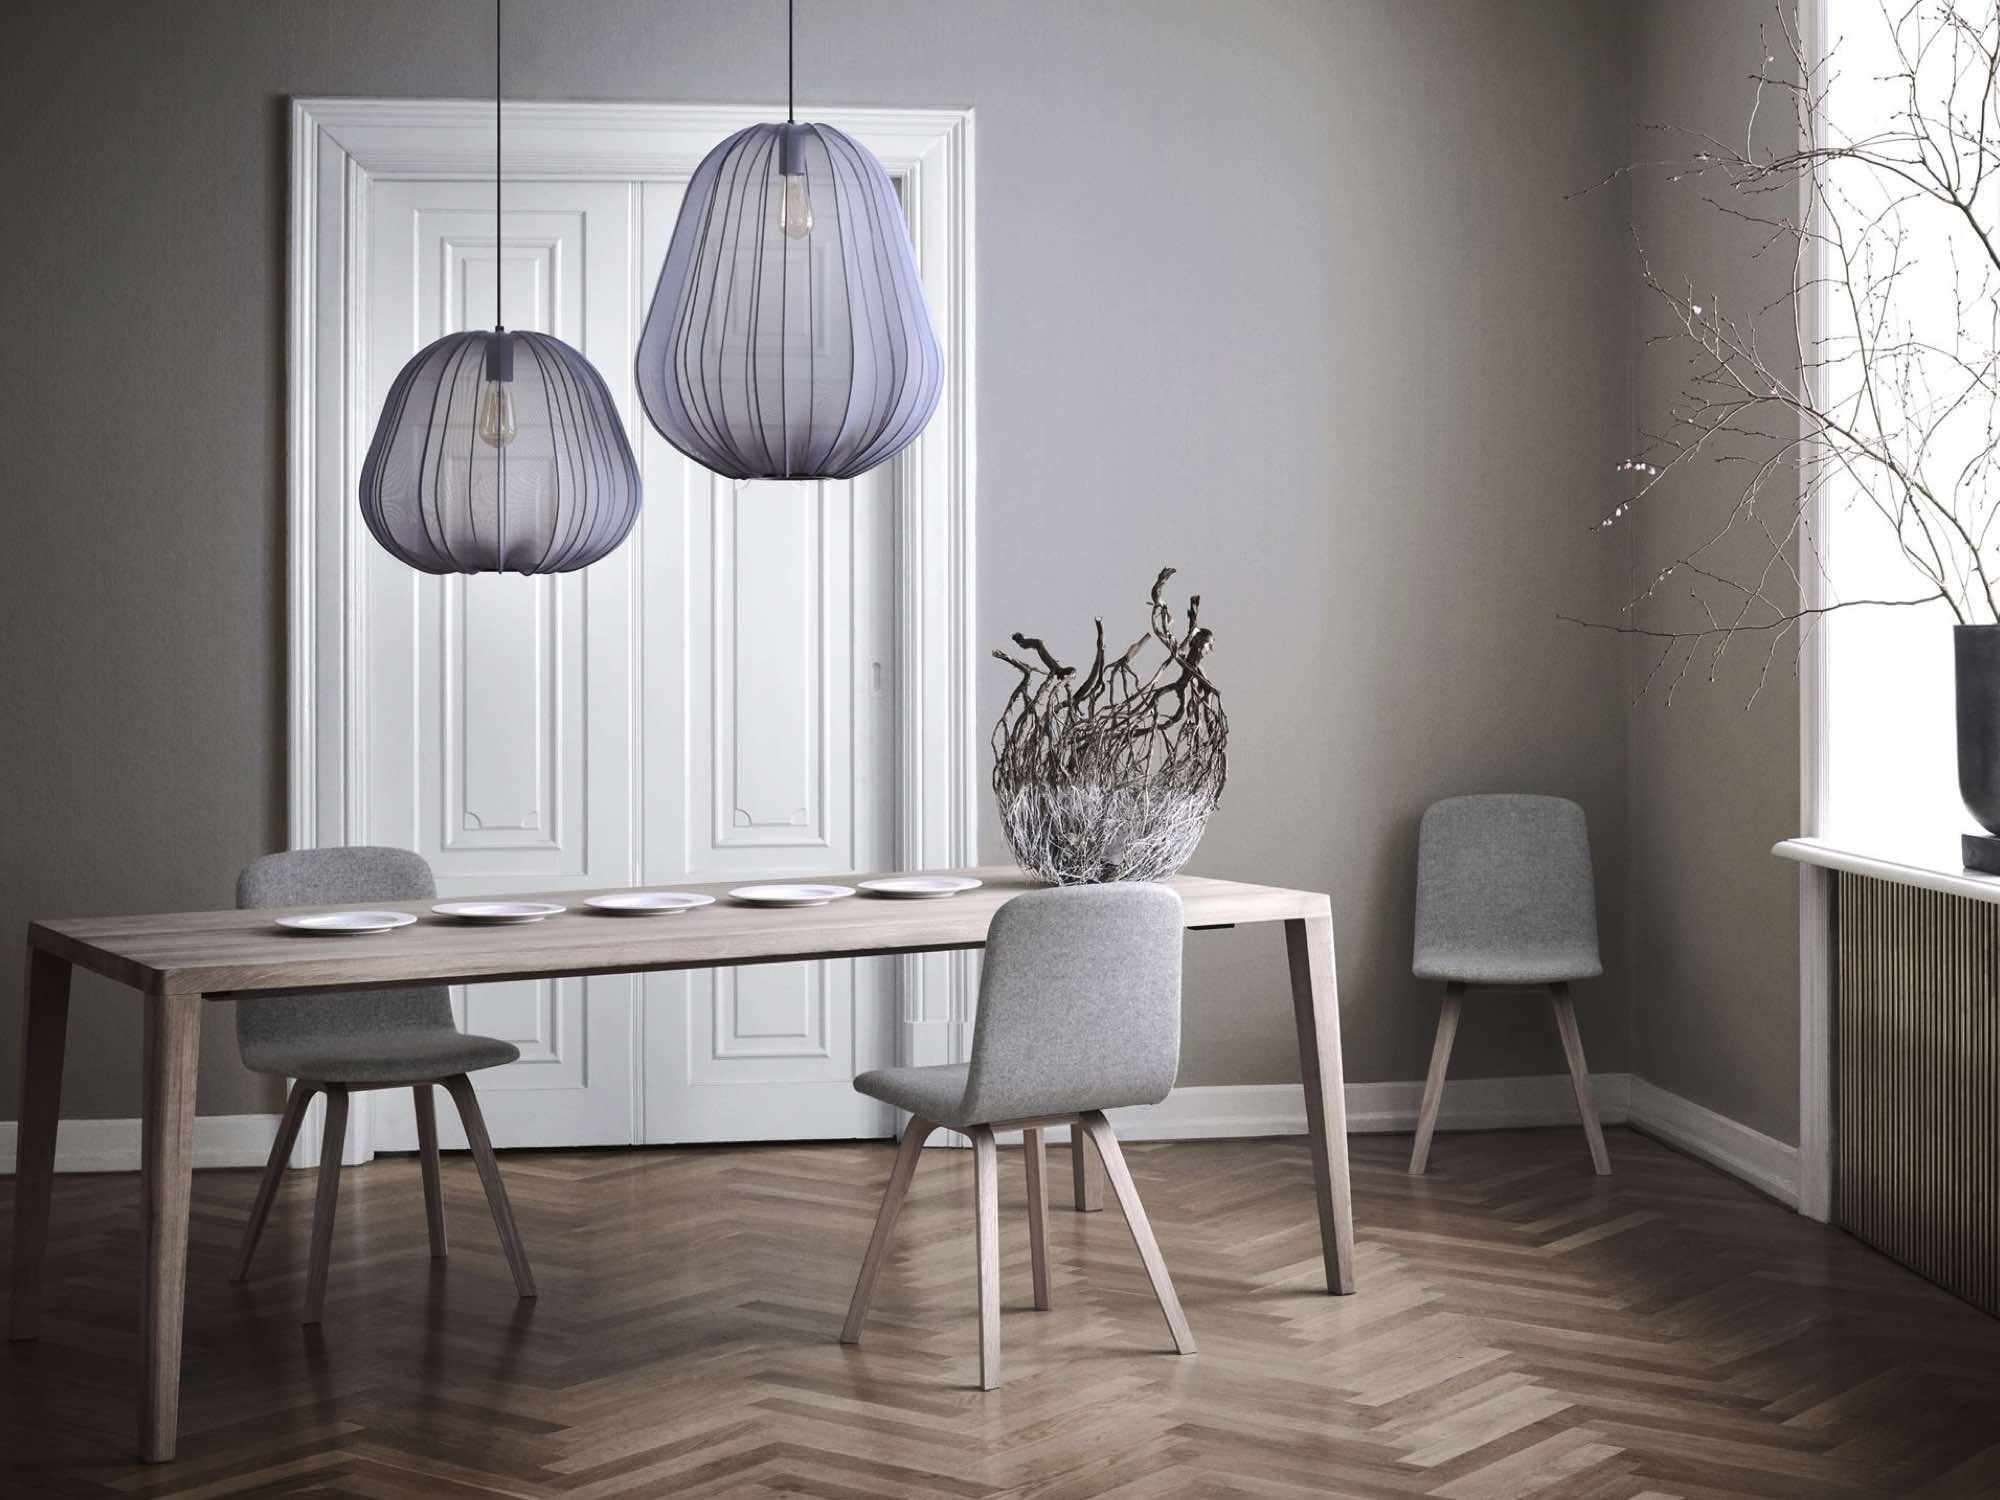 Bolia Palm Chair Graceful Table Balloon Ninove